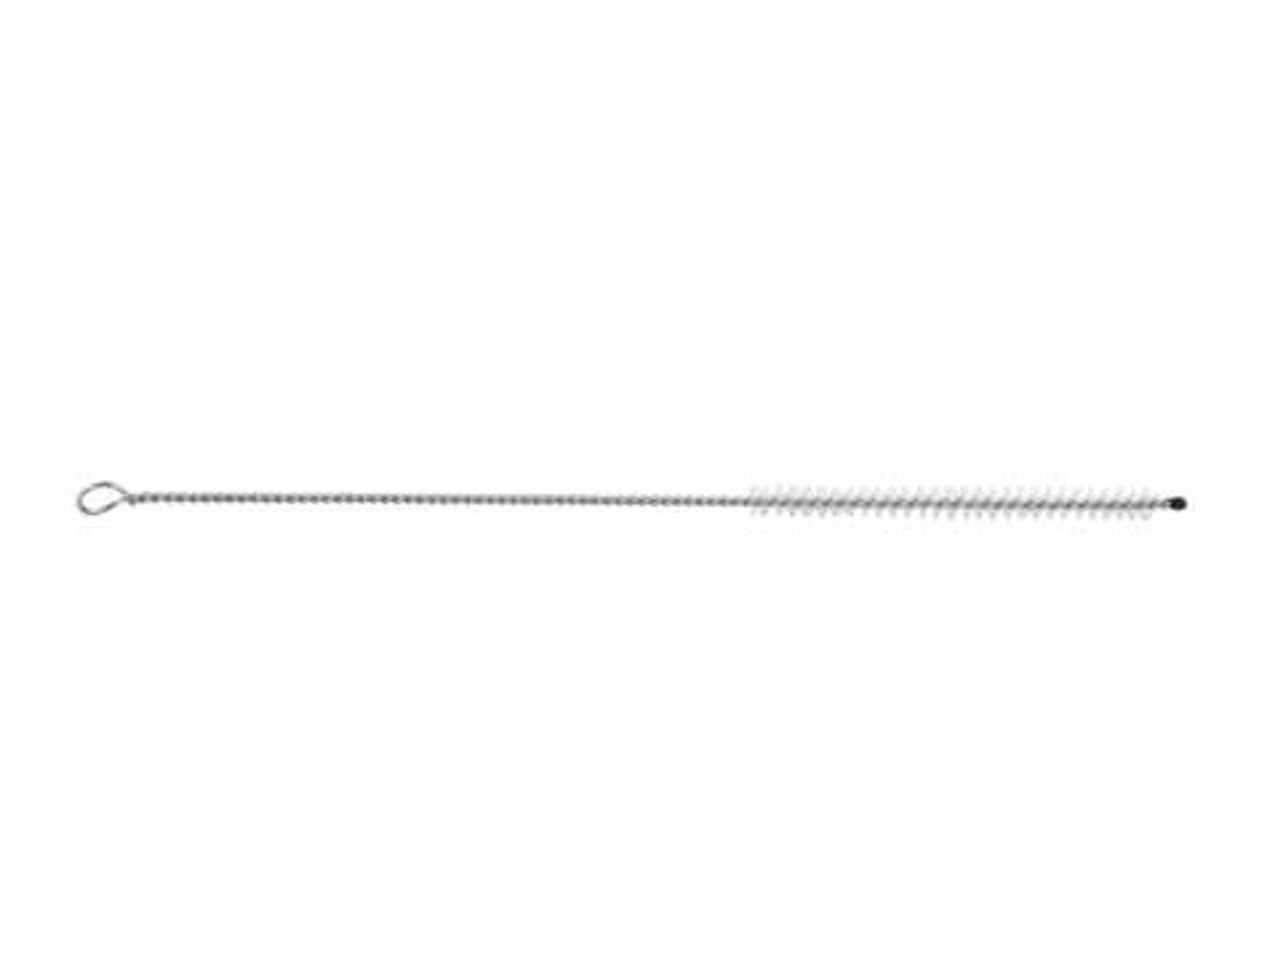 Shank Brush 6 1/4 inches long